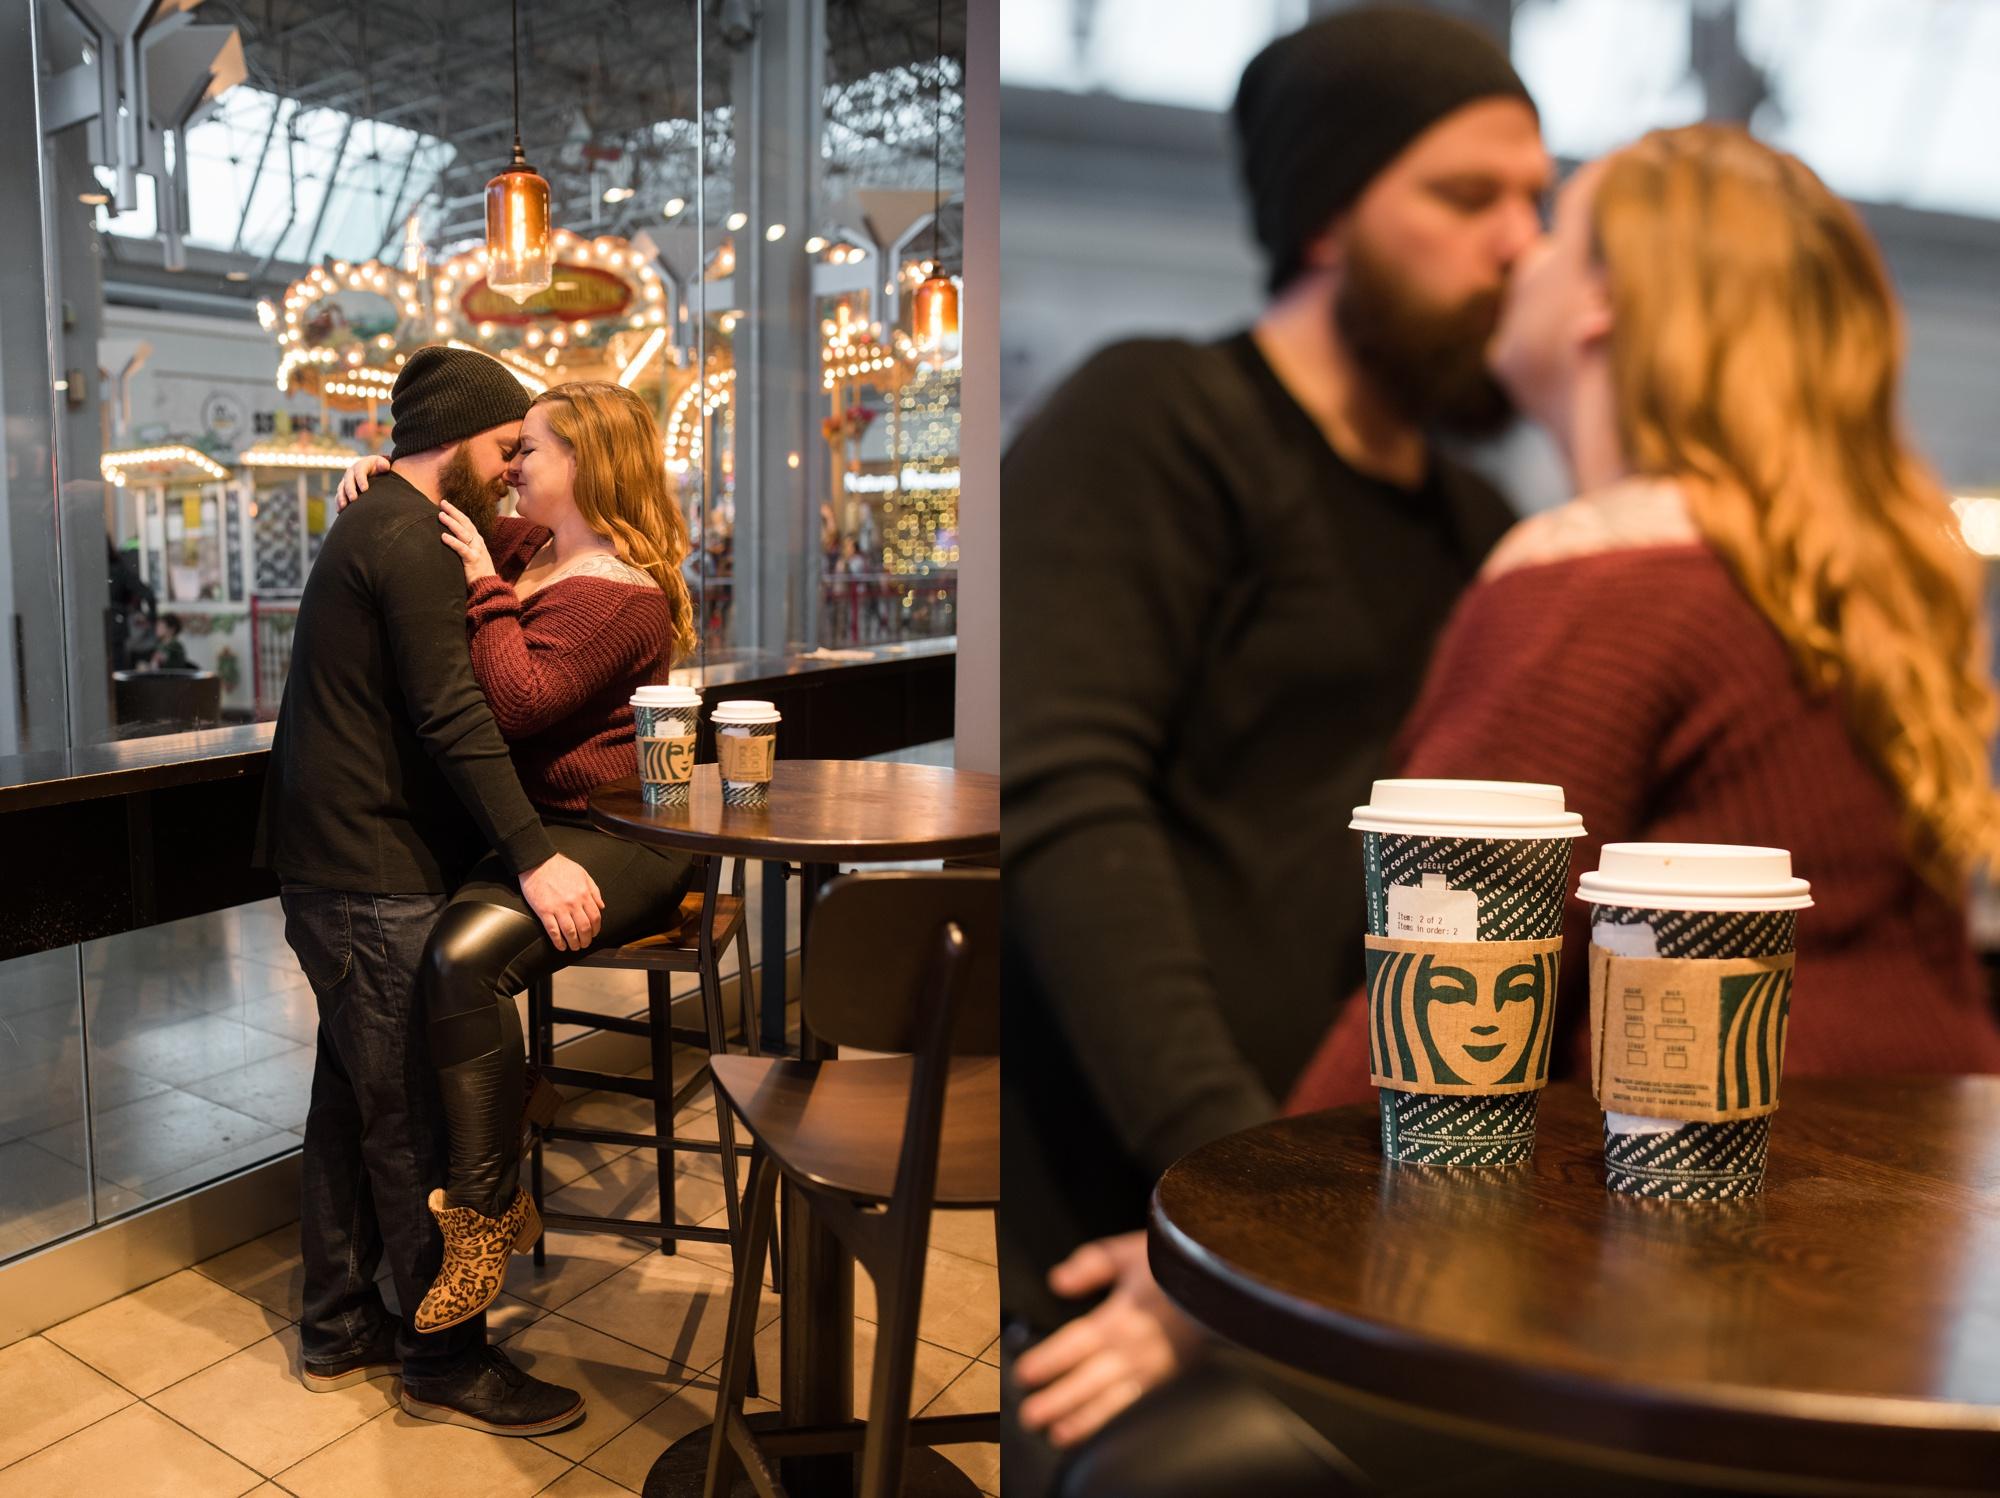 One year anniversary session at Starbucks